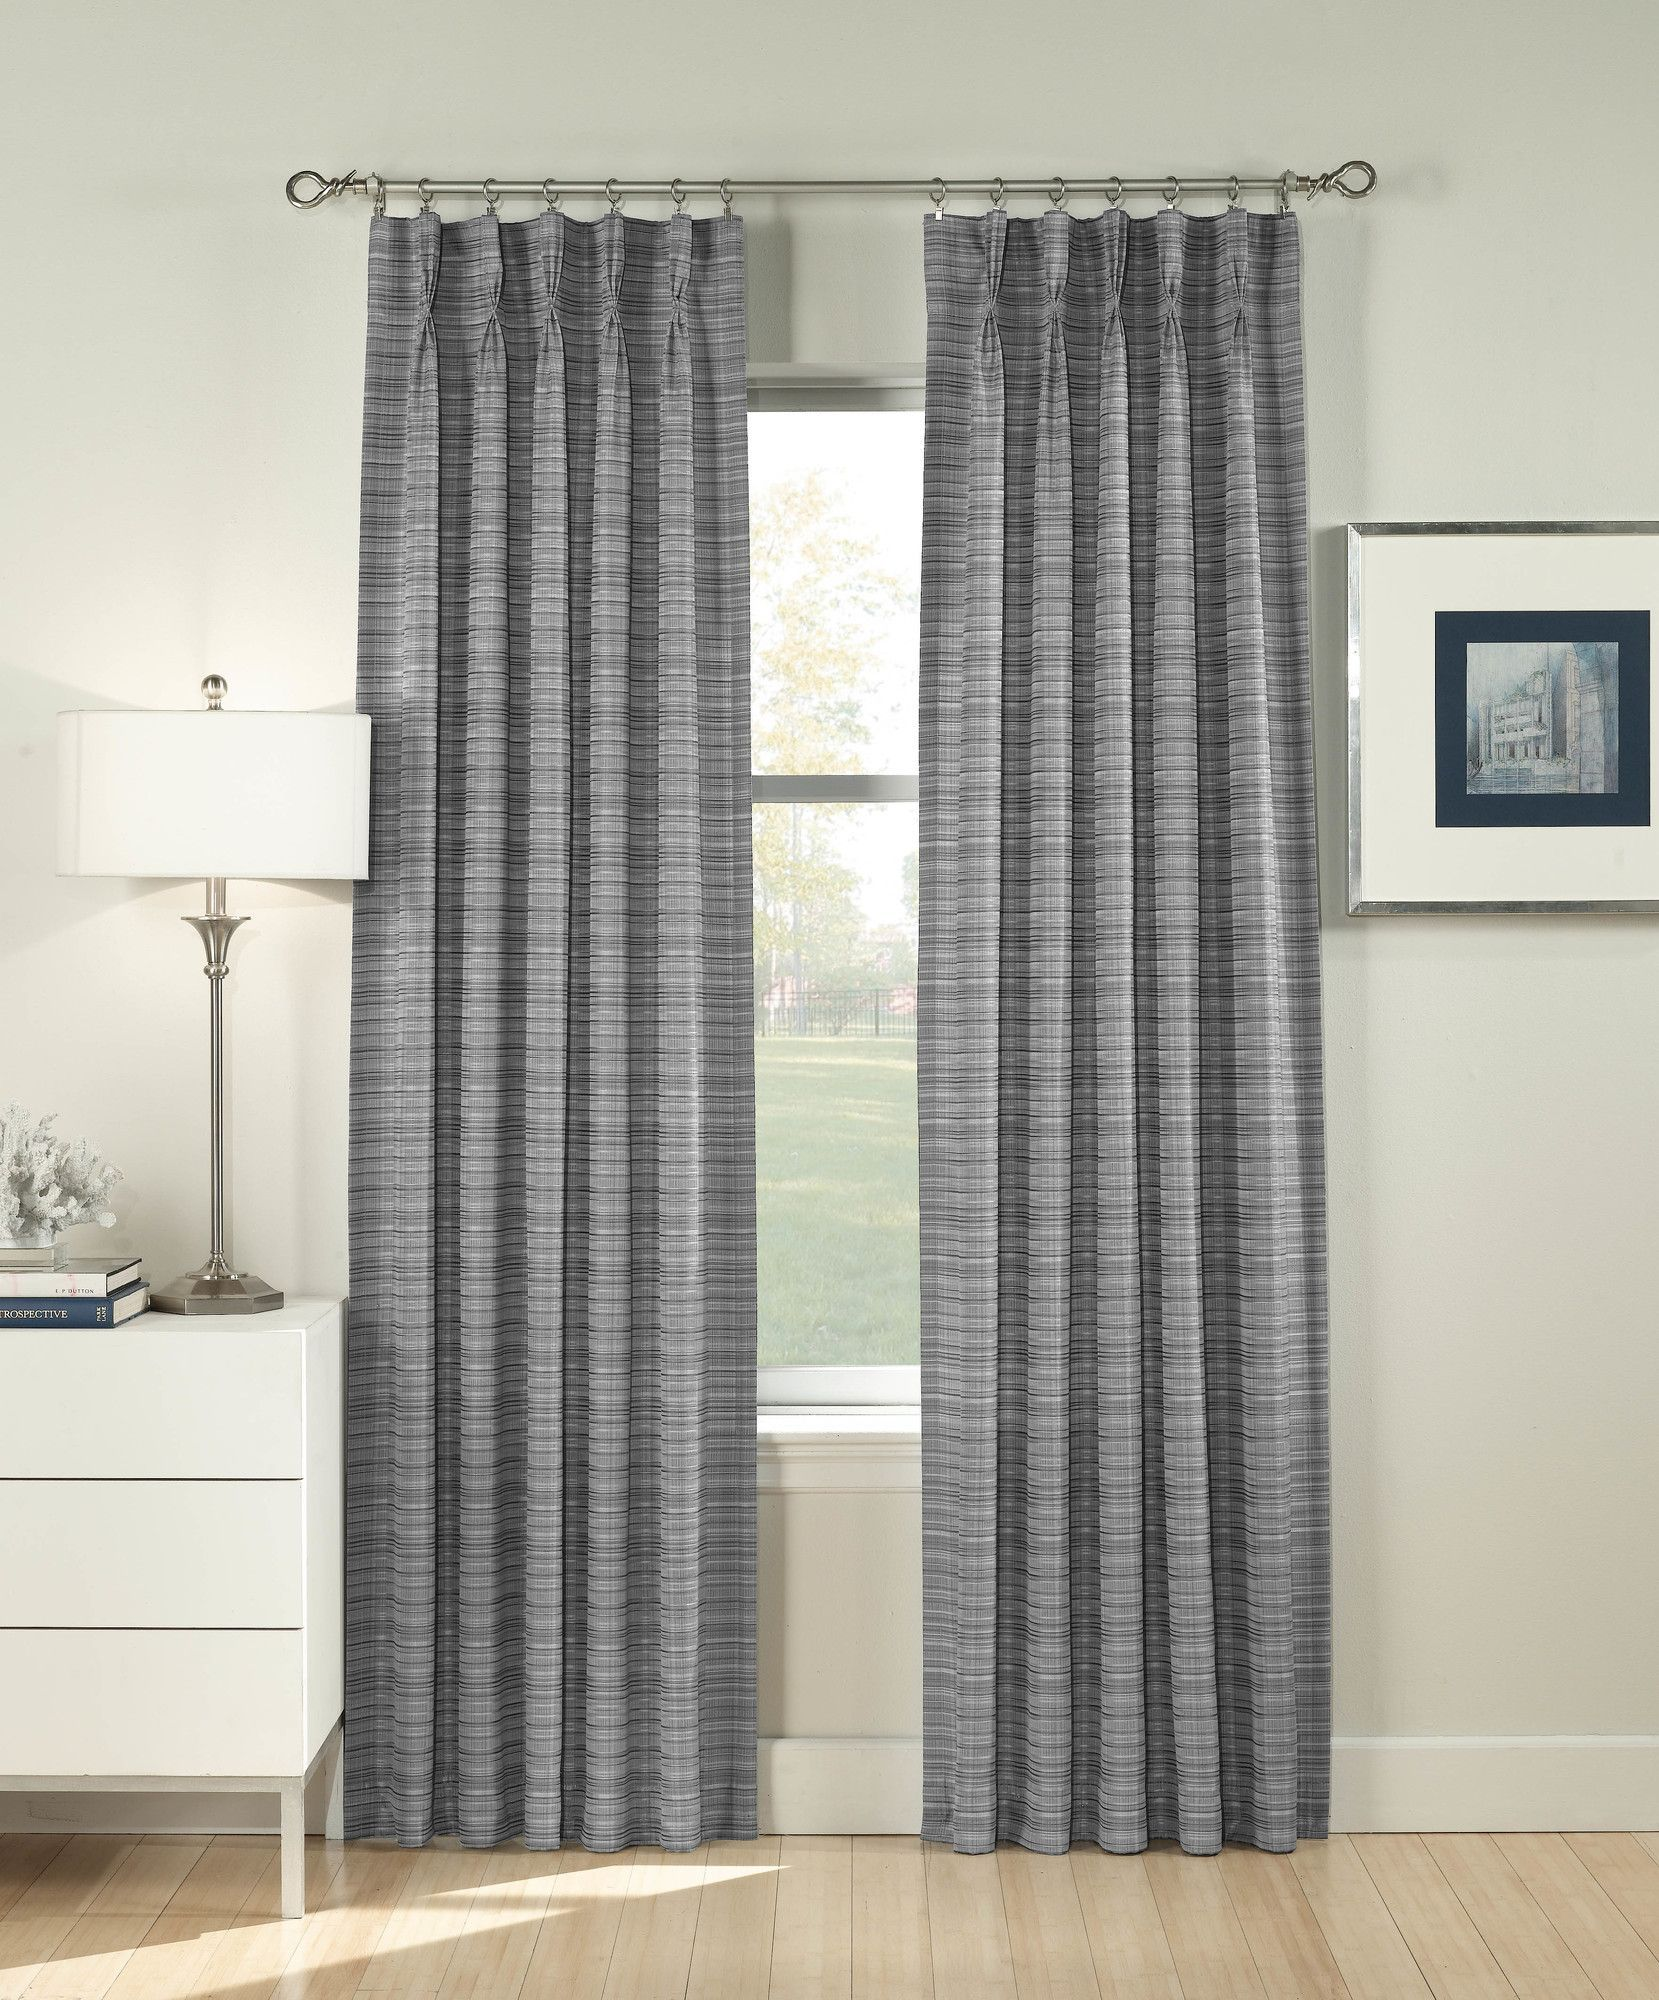 Glenn Single Curtain Panel | Curtain panels and Curtains for Single Pinch Pleat Curtains  51ane